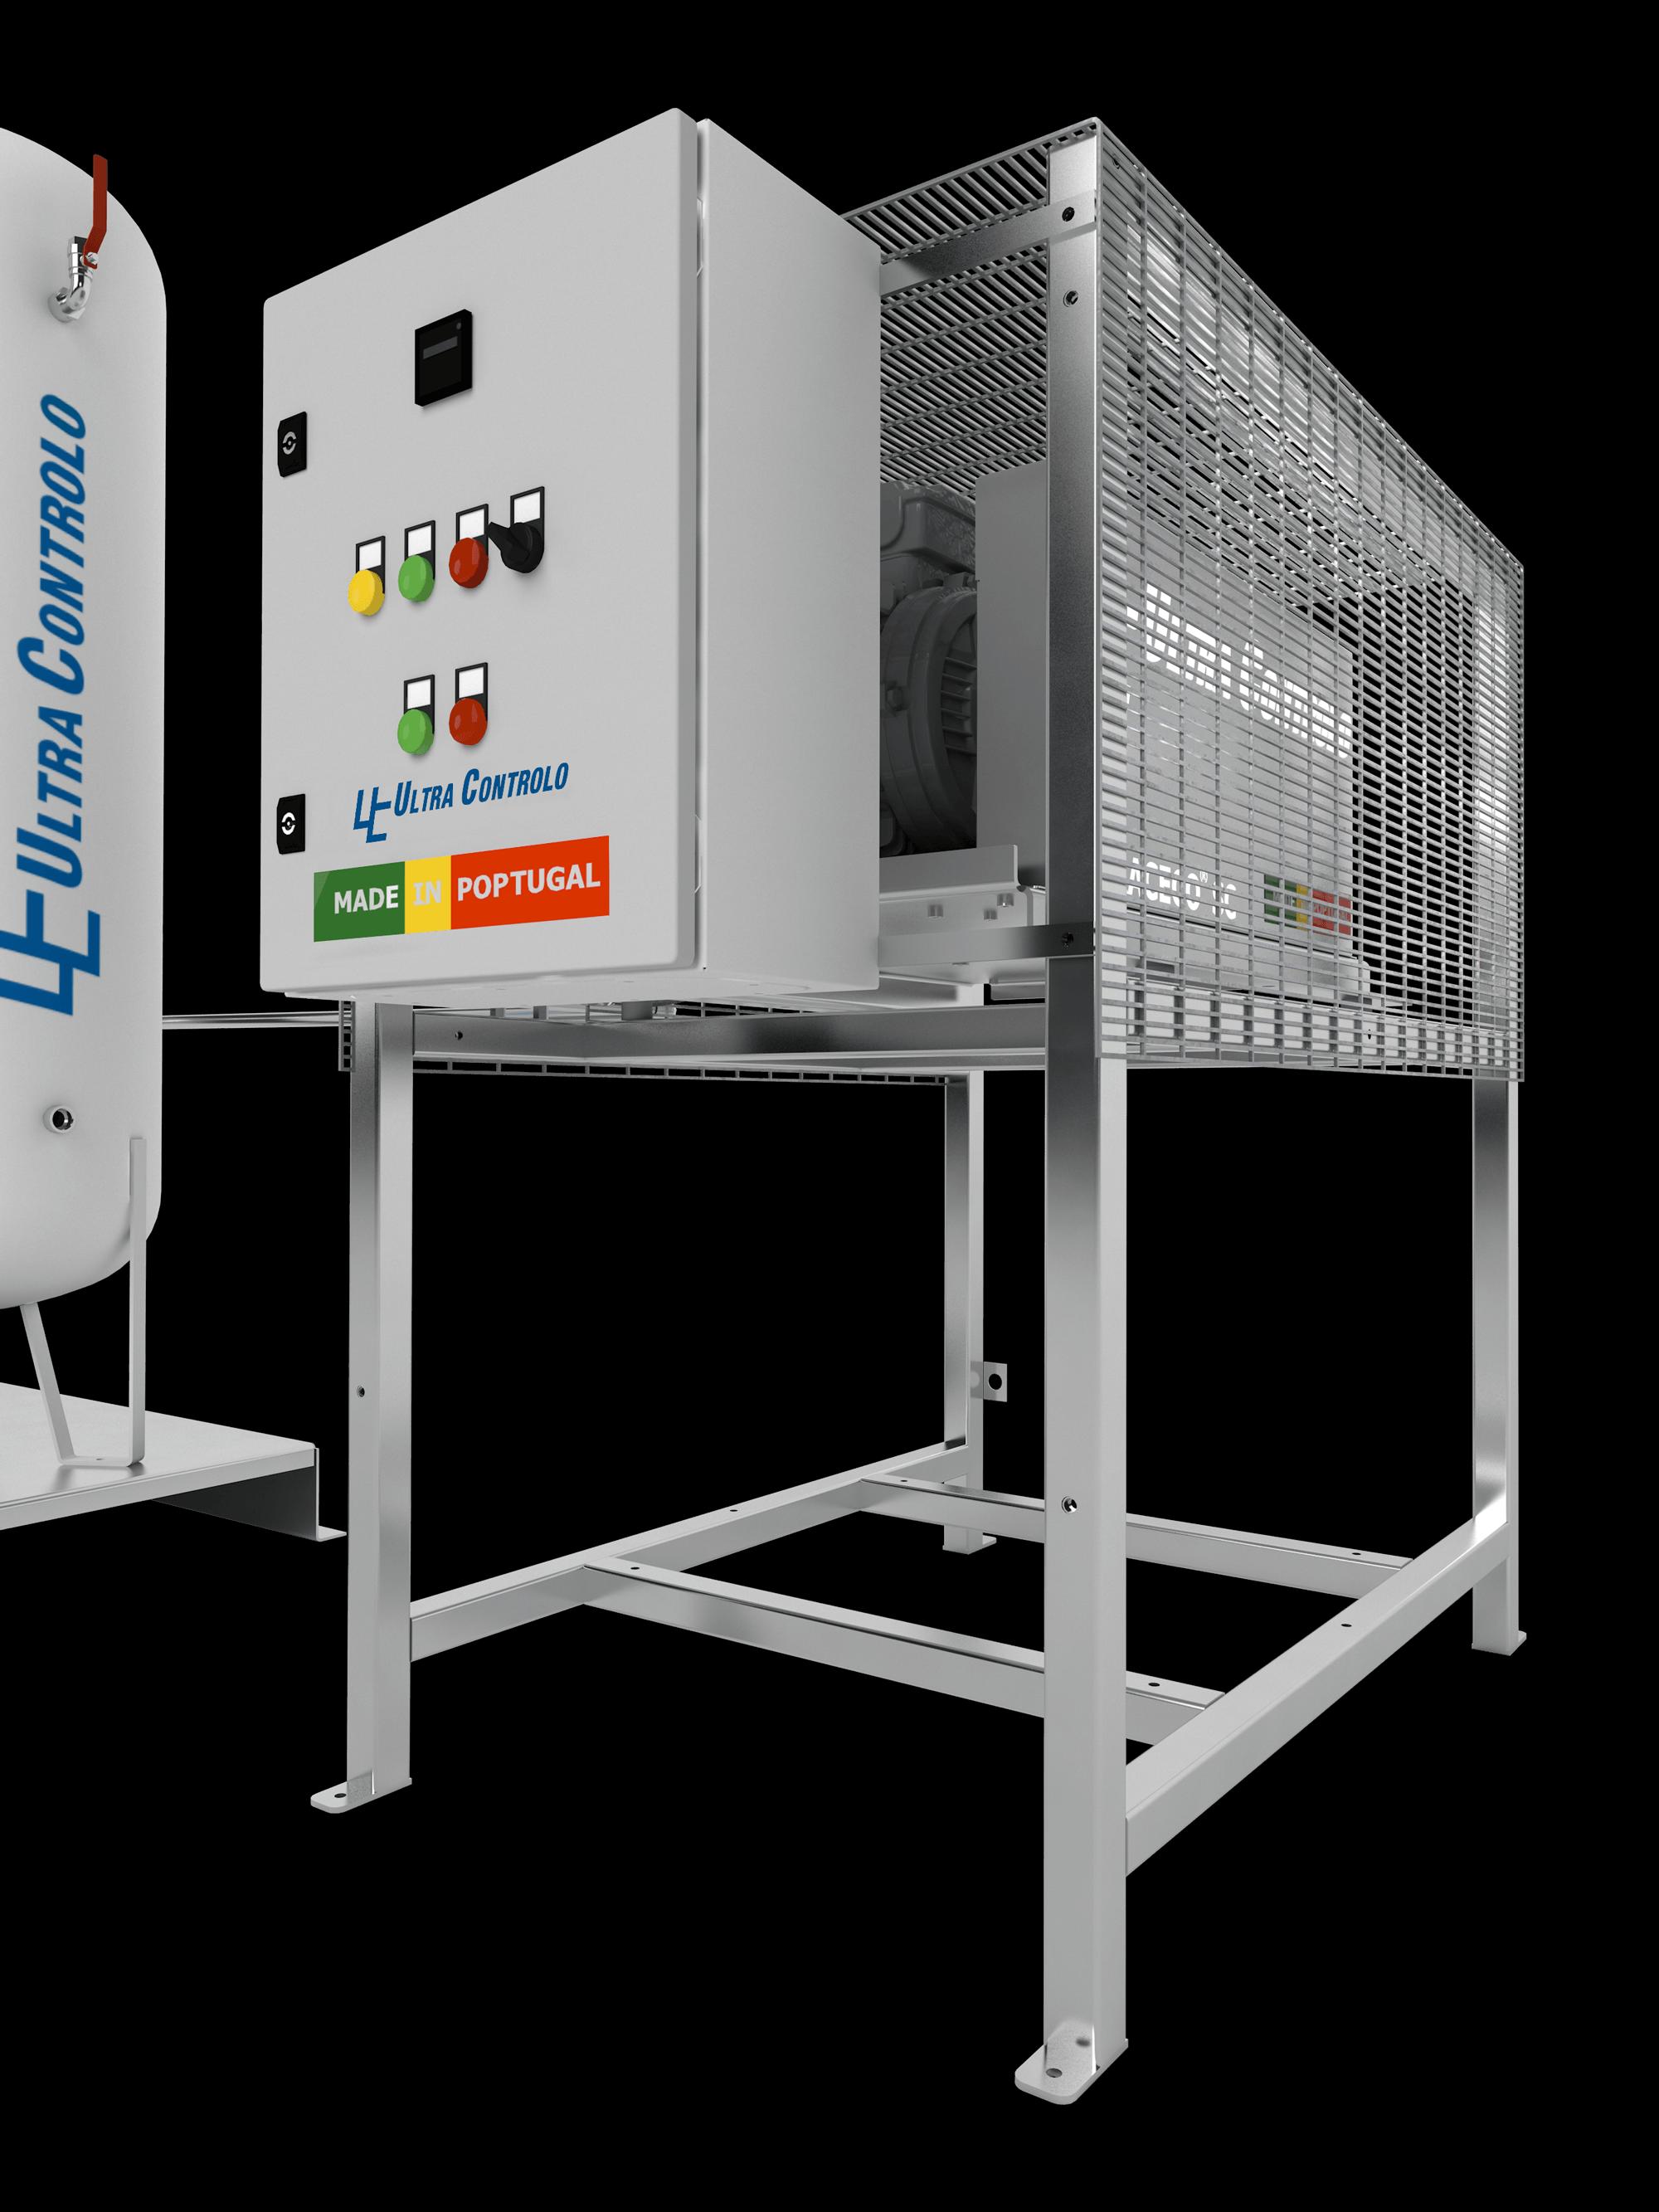 Hospital Industrial Compressed Air